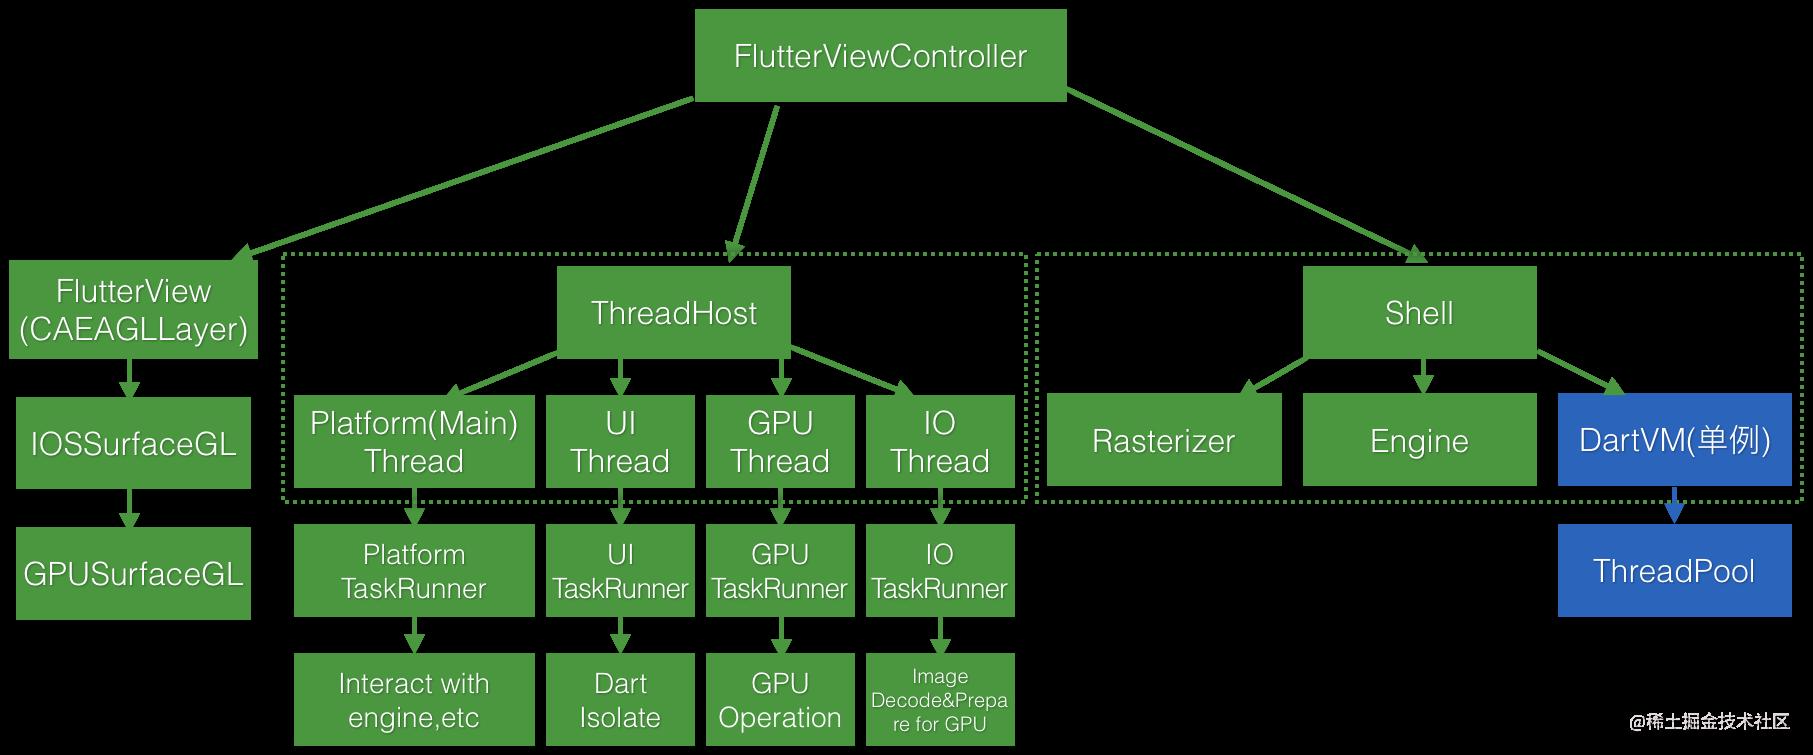 ios-flutterviewcontroller-logic-behind